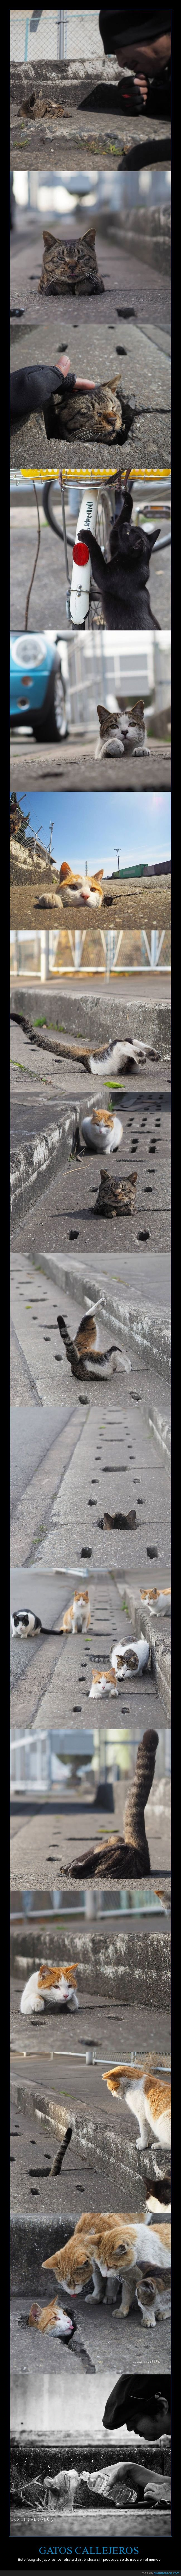 callejeros,divirtiéndose,gatos